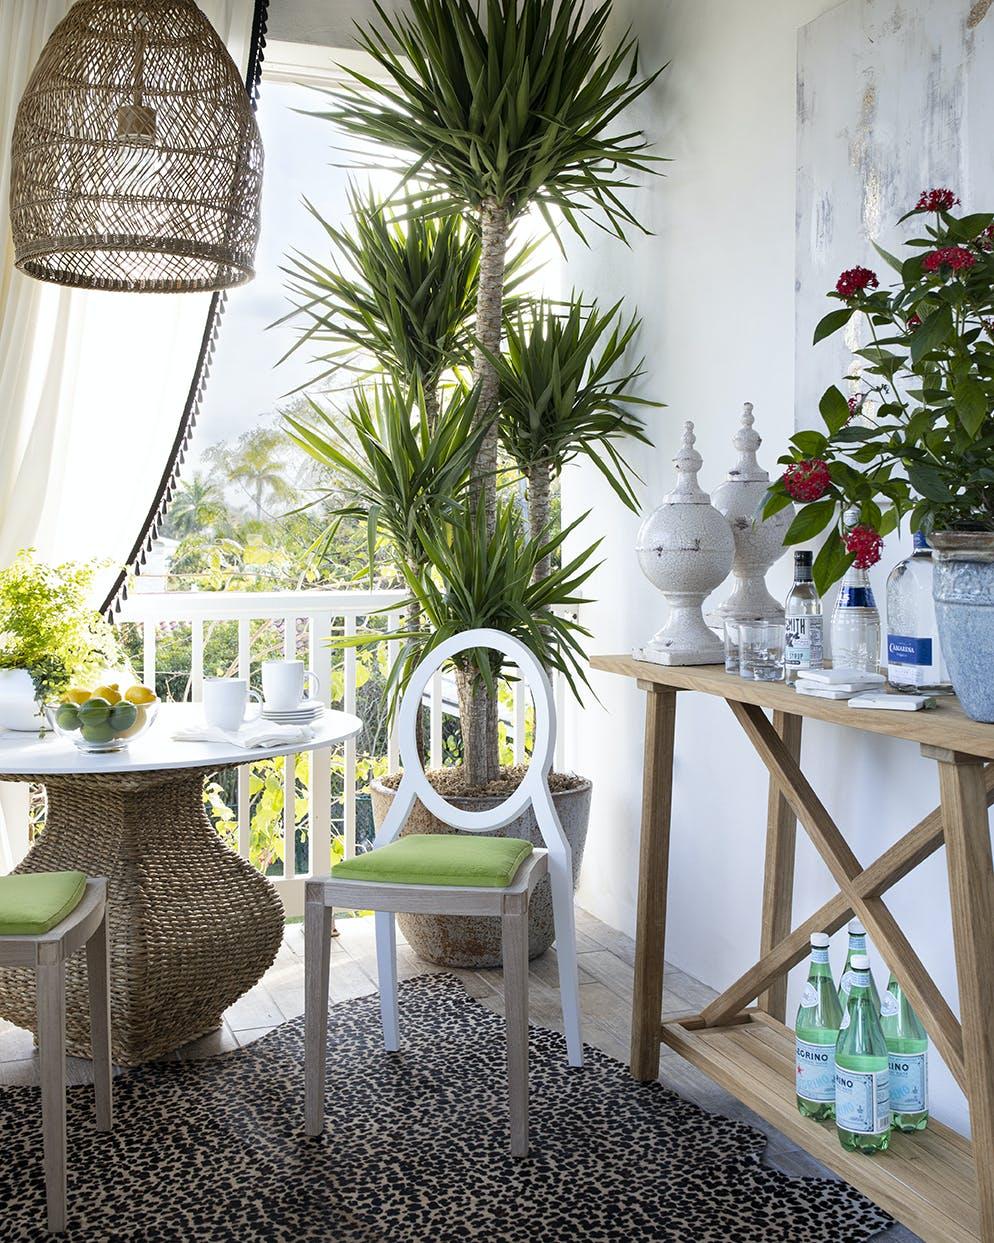 Image of Tablero mesa redonda Dekton Kairos 1 in Nice weather: let's make the most of it! - Cosentino